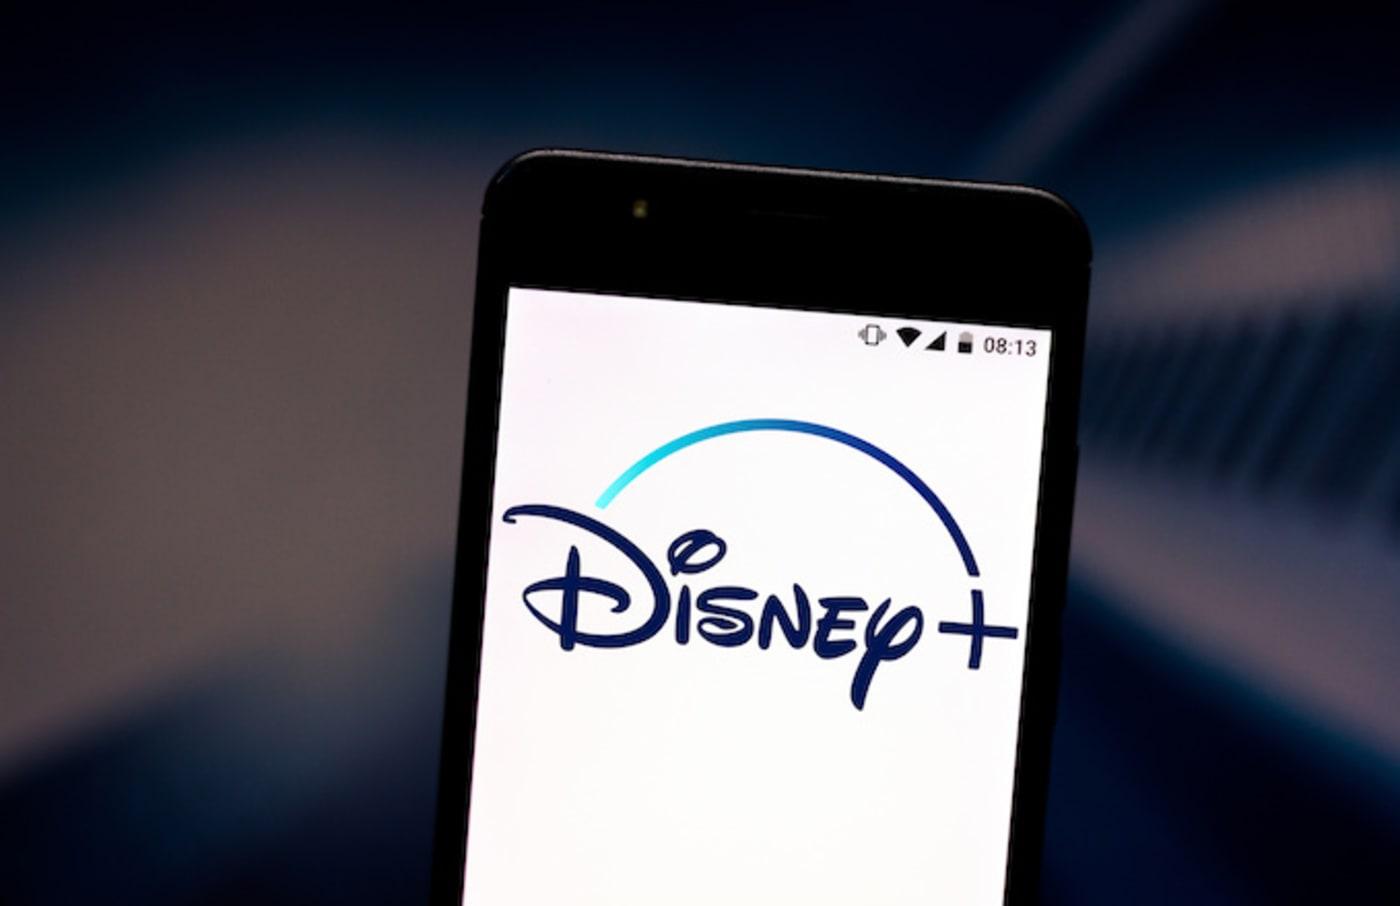 Disney+ (Plus) logo seen displayed on a smartphone.